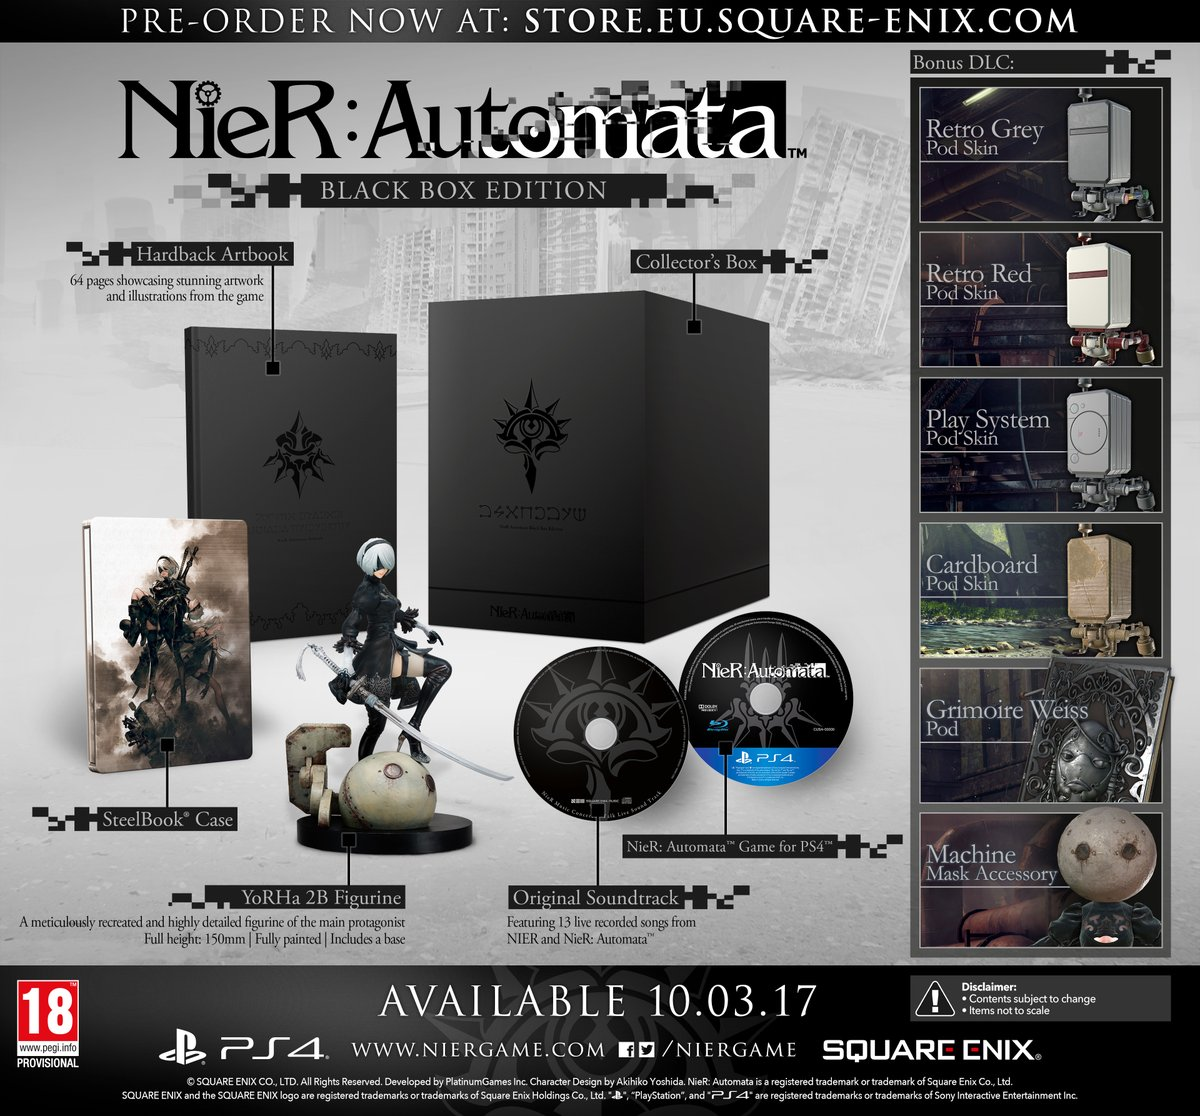 NieR: Automata -collectors-box-noire